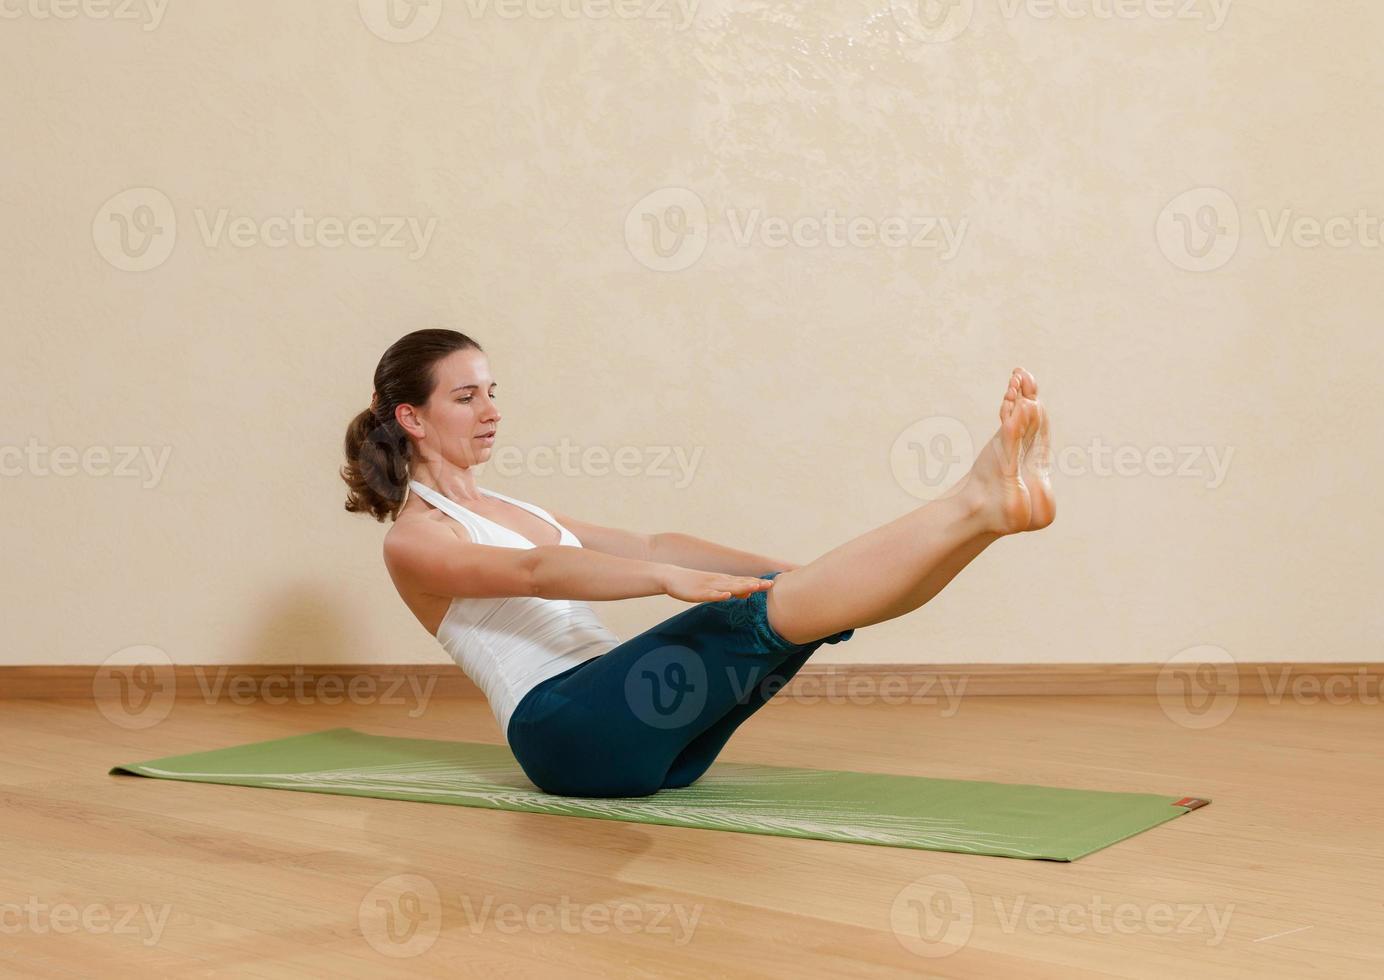 femme caucasienne pratique le yoga au studio (paripurna navasana photo